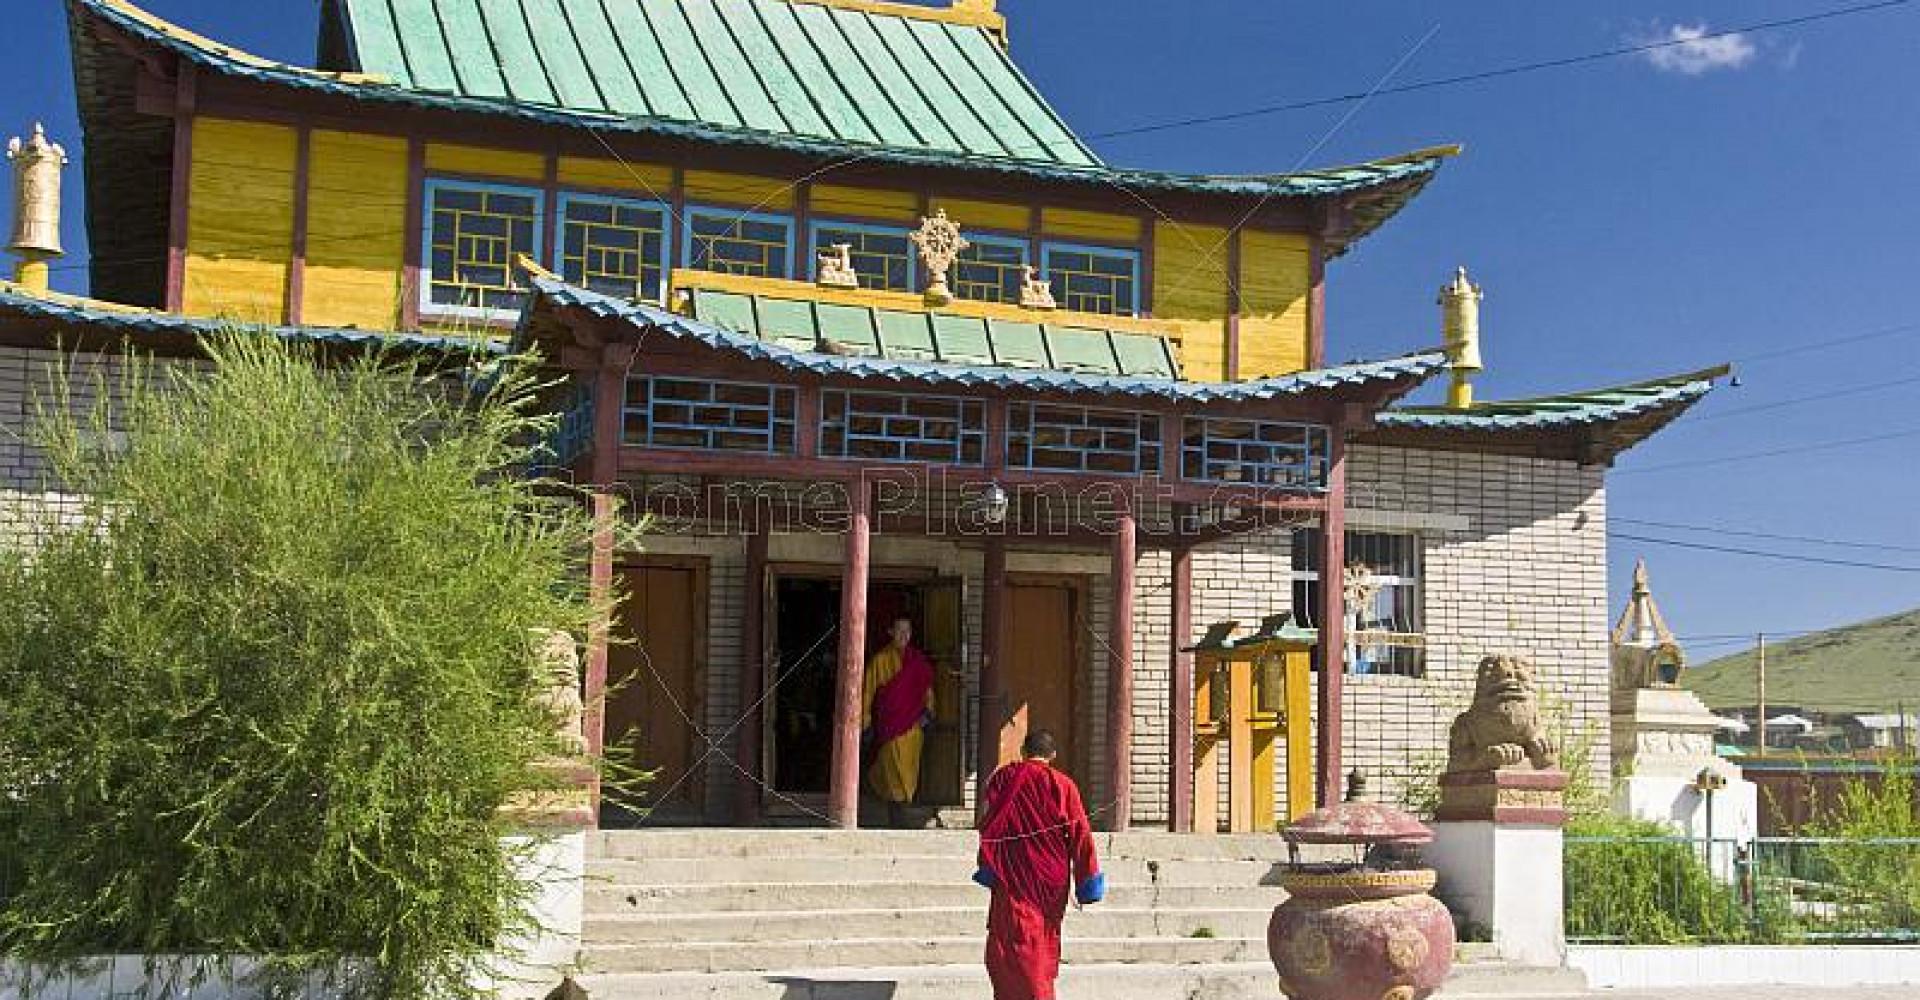 Gandan Muntsaglan Monastery